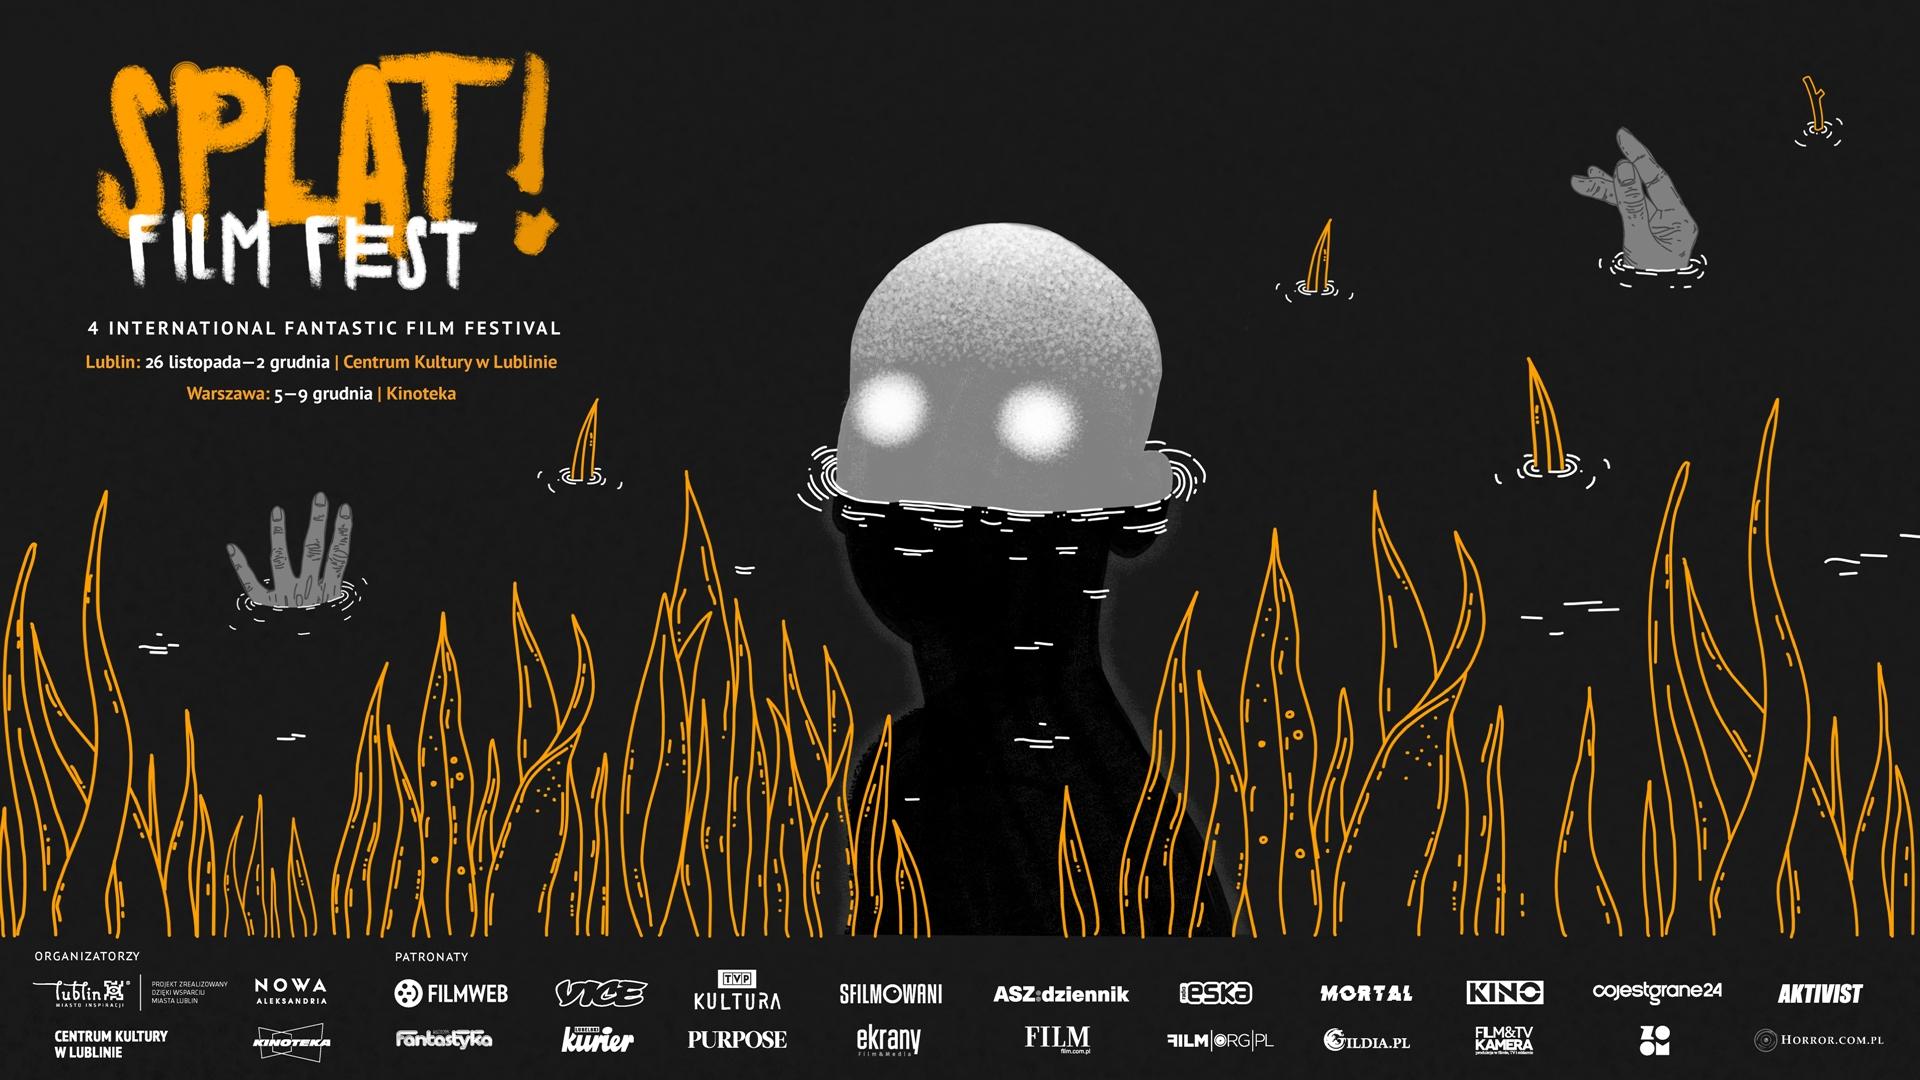 Splat!Film Fest 4 – oczekiwania